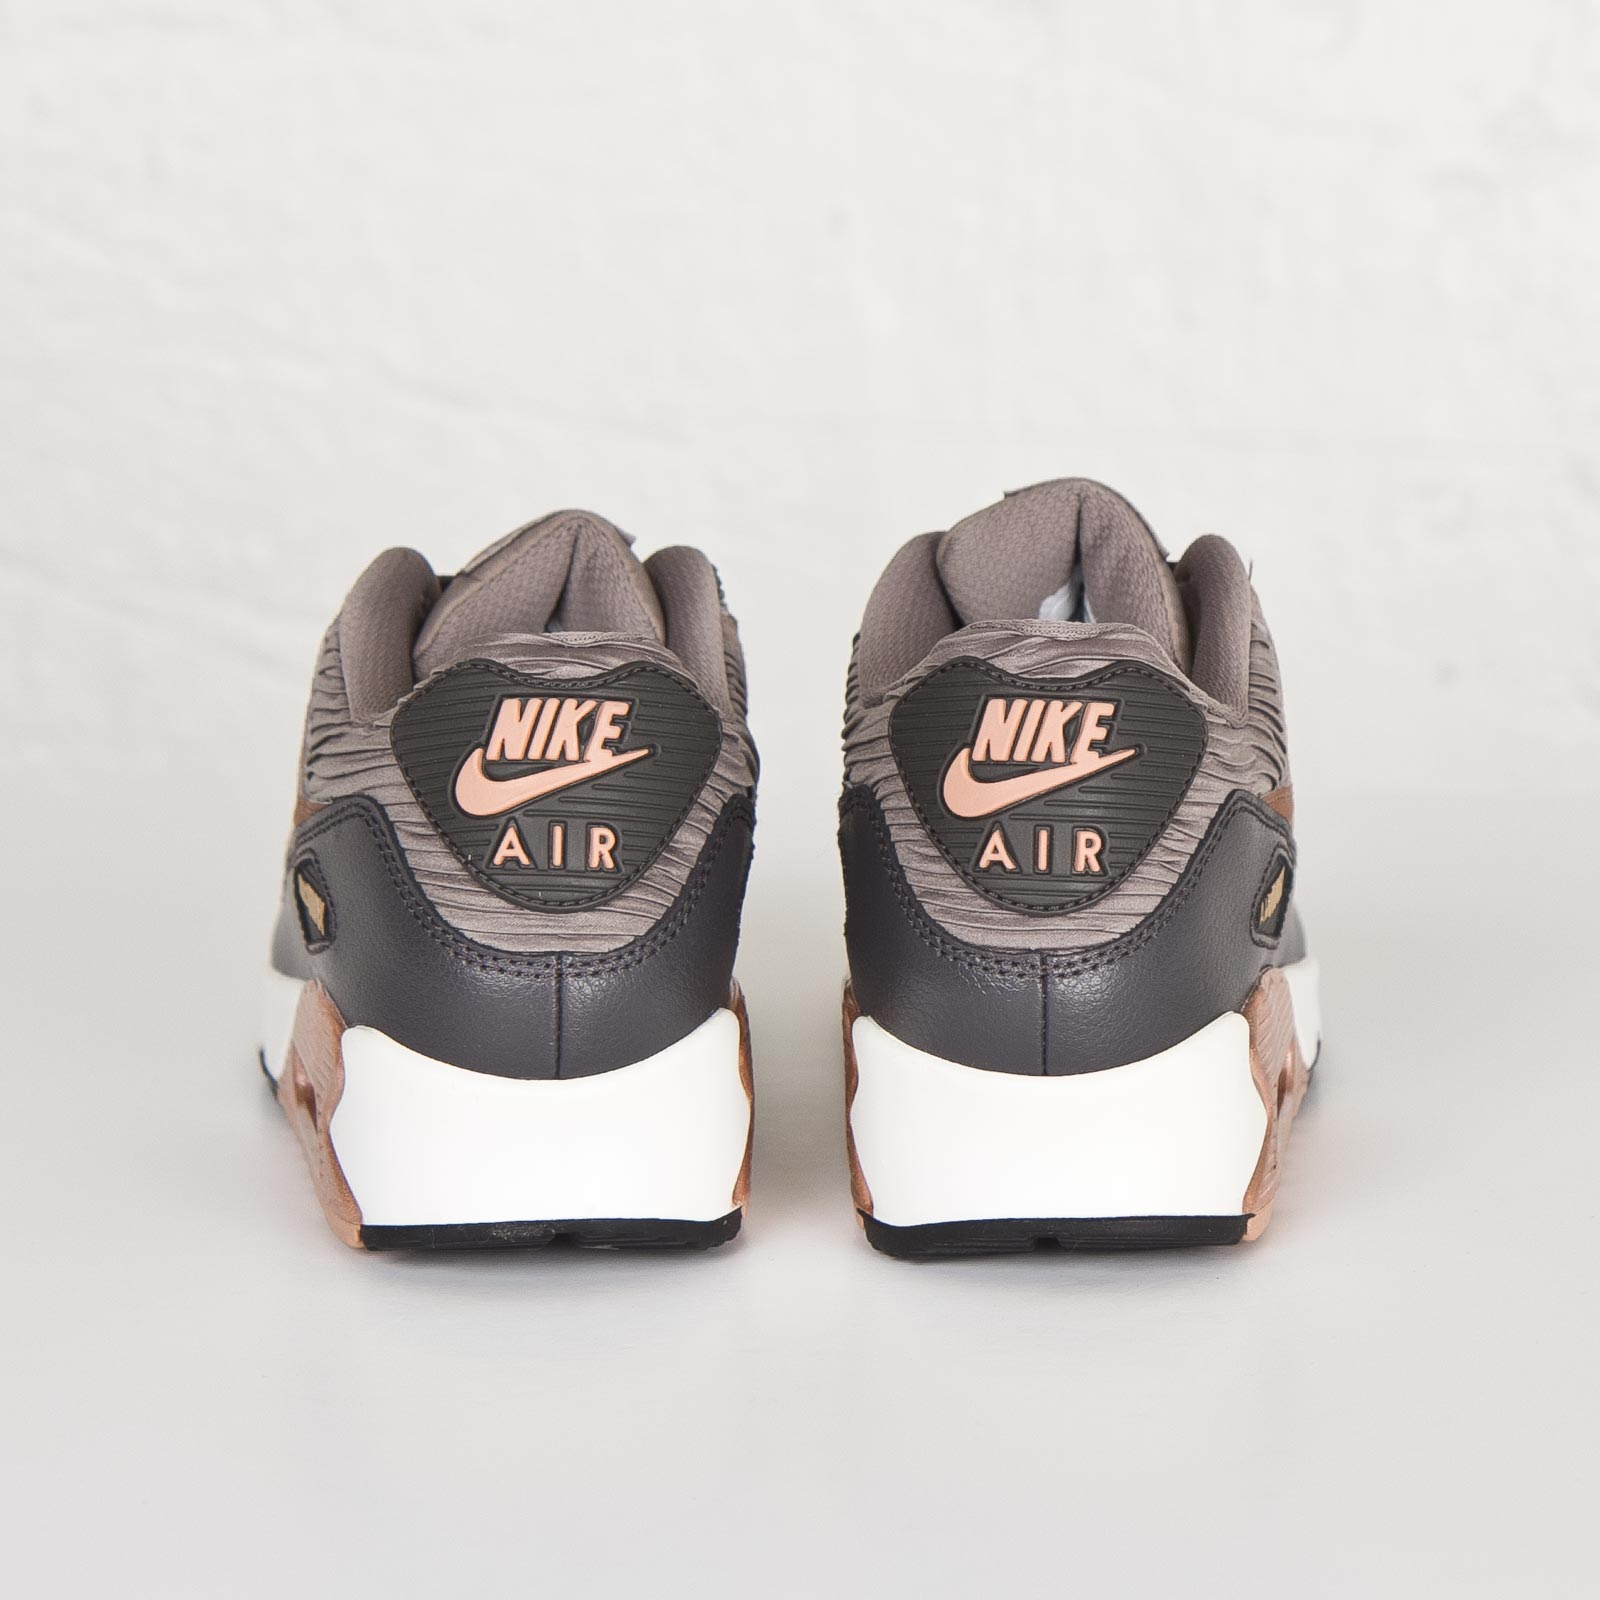 hot sale online a54d7 12b9e Nike Wmns Air Max 90 Leather - 768887-201 - Sneakersnstuff   sneakers    streetwear online since 1999